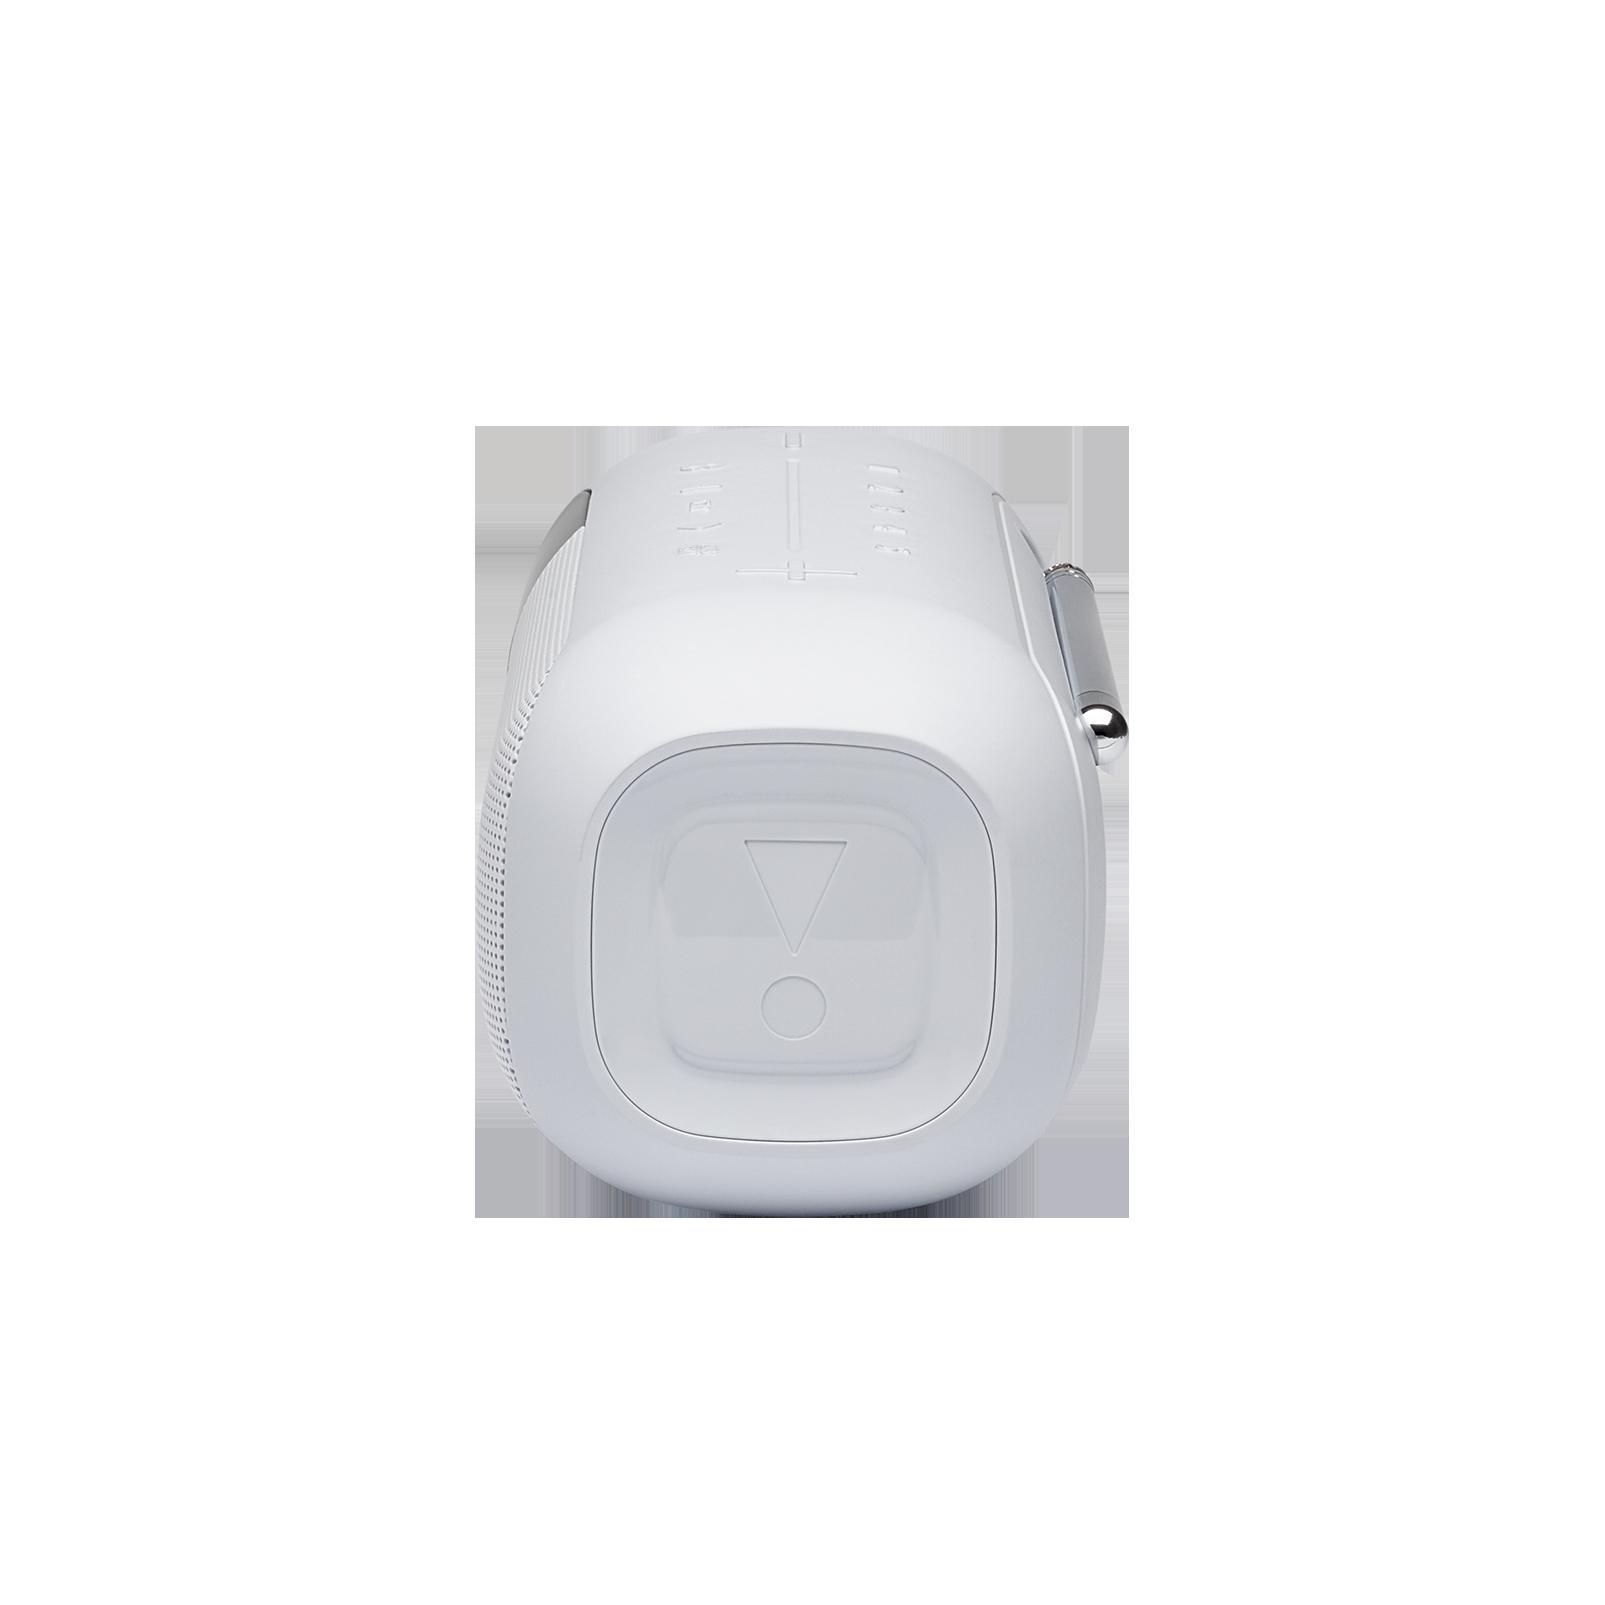 JBL Tuner 2 - White - Portable DAB/DAB+/FM radio with Bluetooth - Left